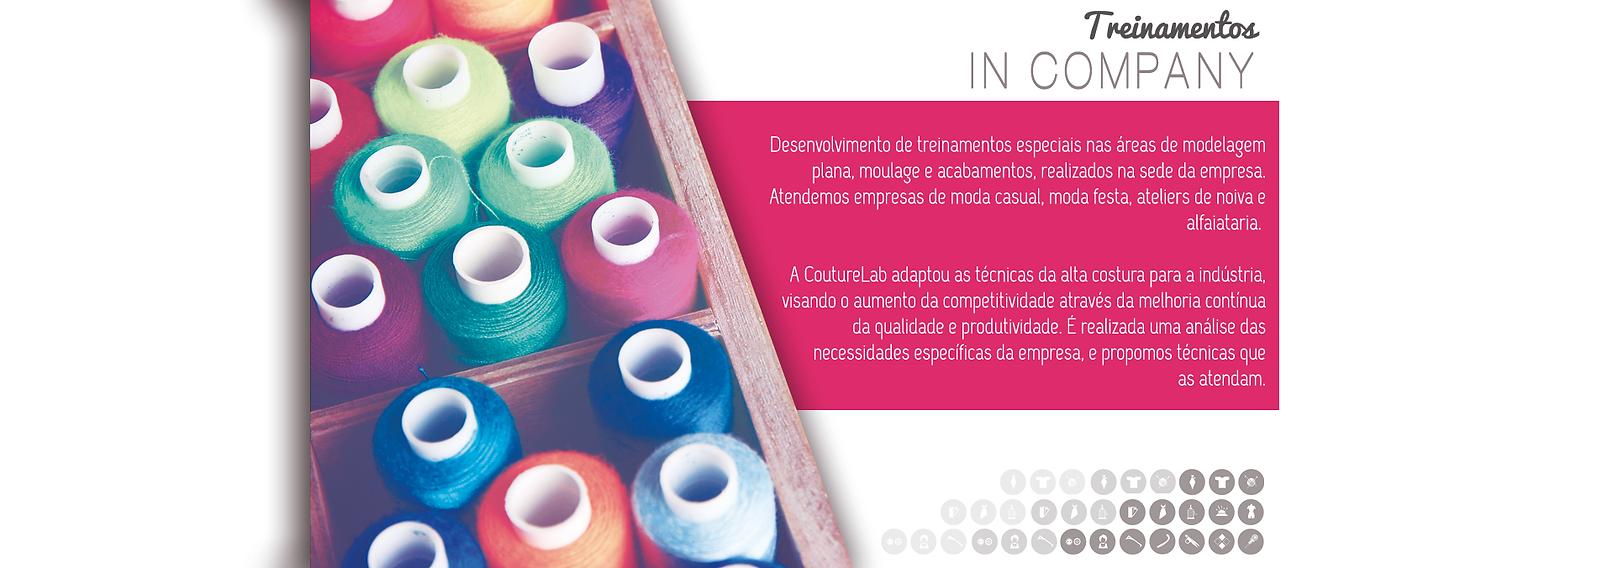 Treinamentos In Company - CoutureLab